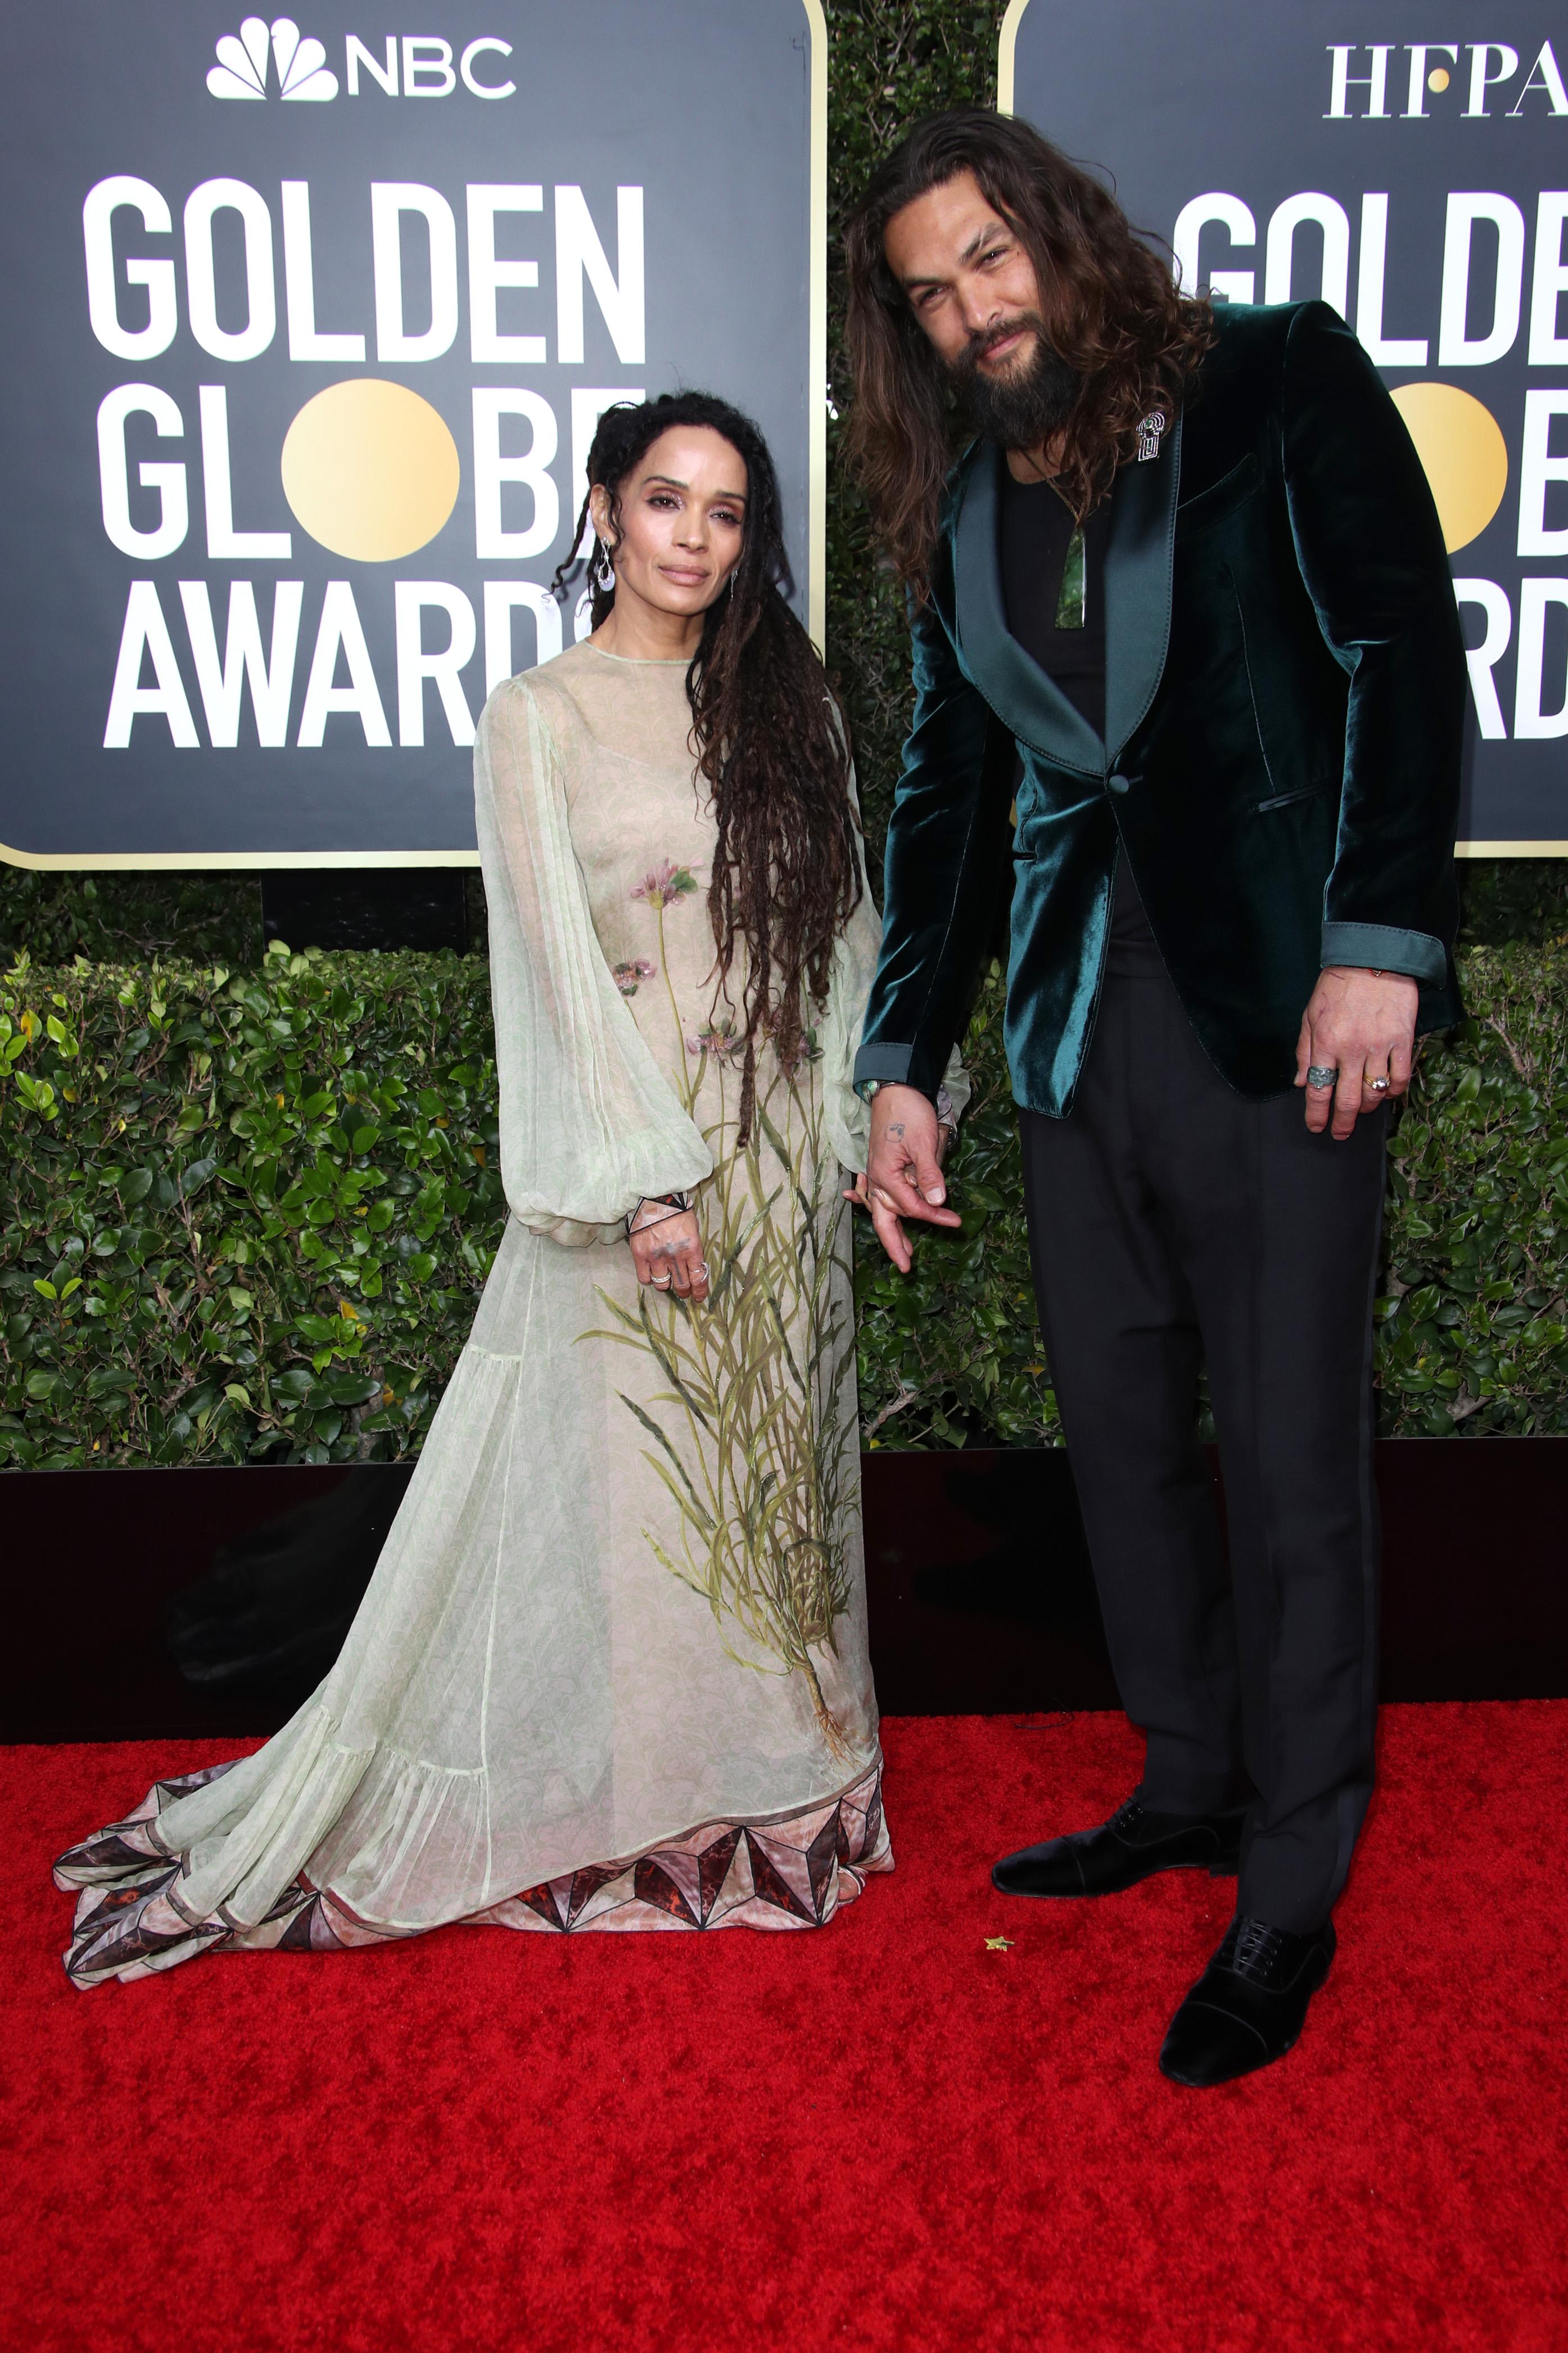 Lisa Bonet and Jason Momoa77th Annual Golden Globe Awards, Arrivals, Los Angeles, USA - 05 Jan 2020